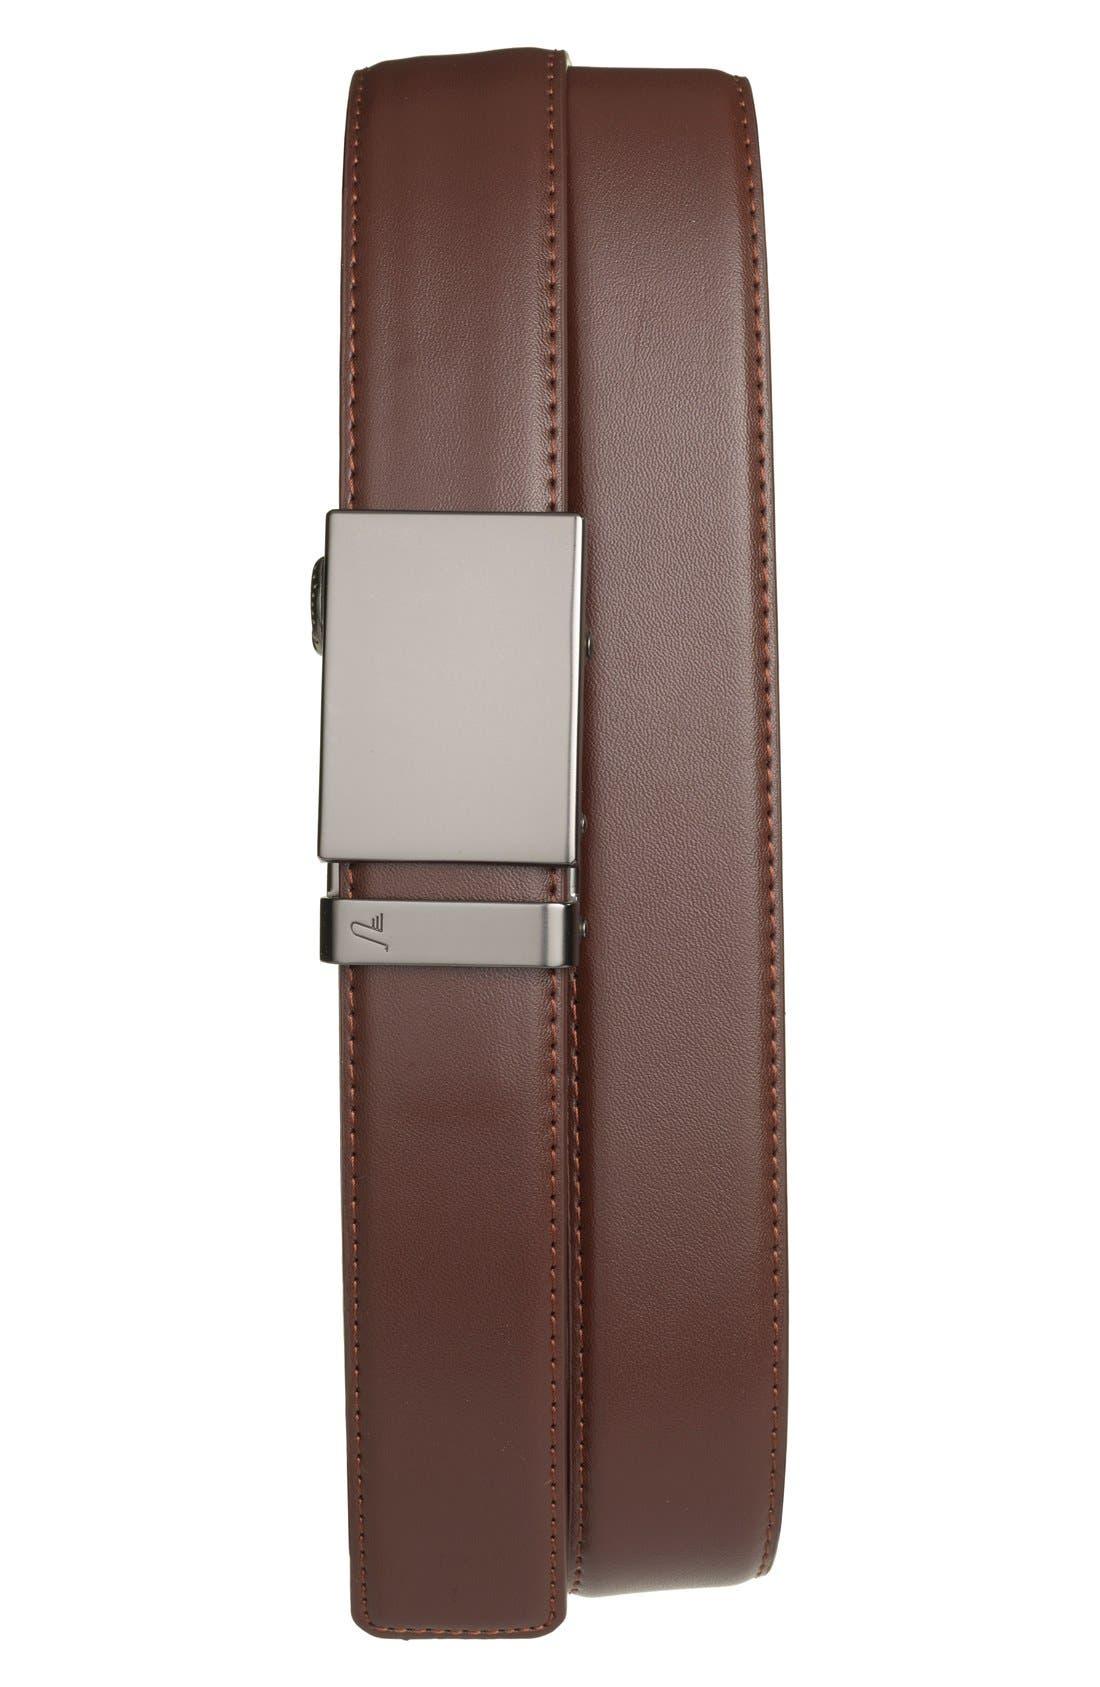 MISSION BELT,                             'Gun Metal' Leather Belt,                             Main thumbnail 1, color,                             GUNMETAL/ CHOCOLATE